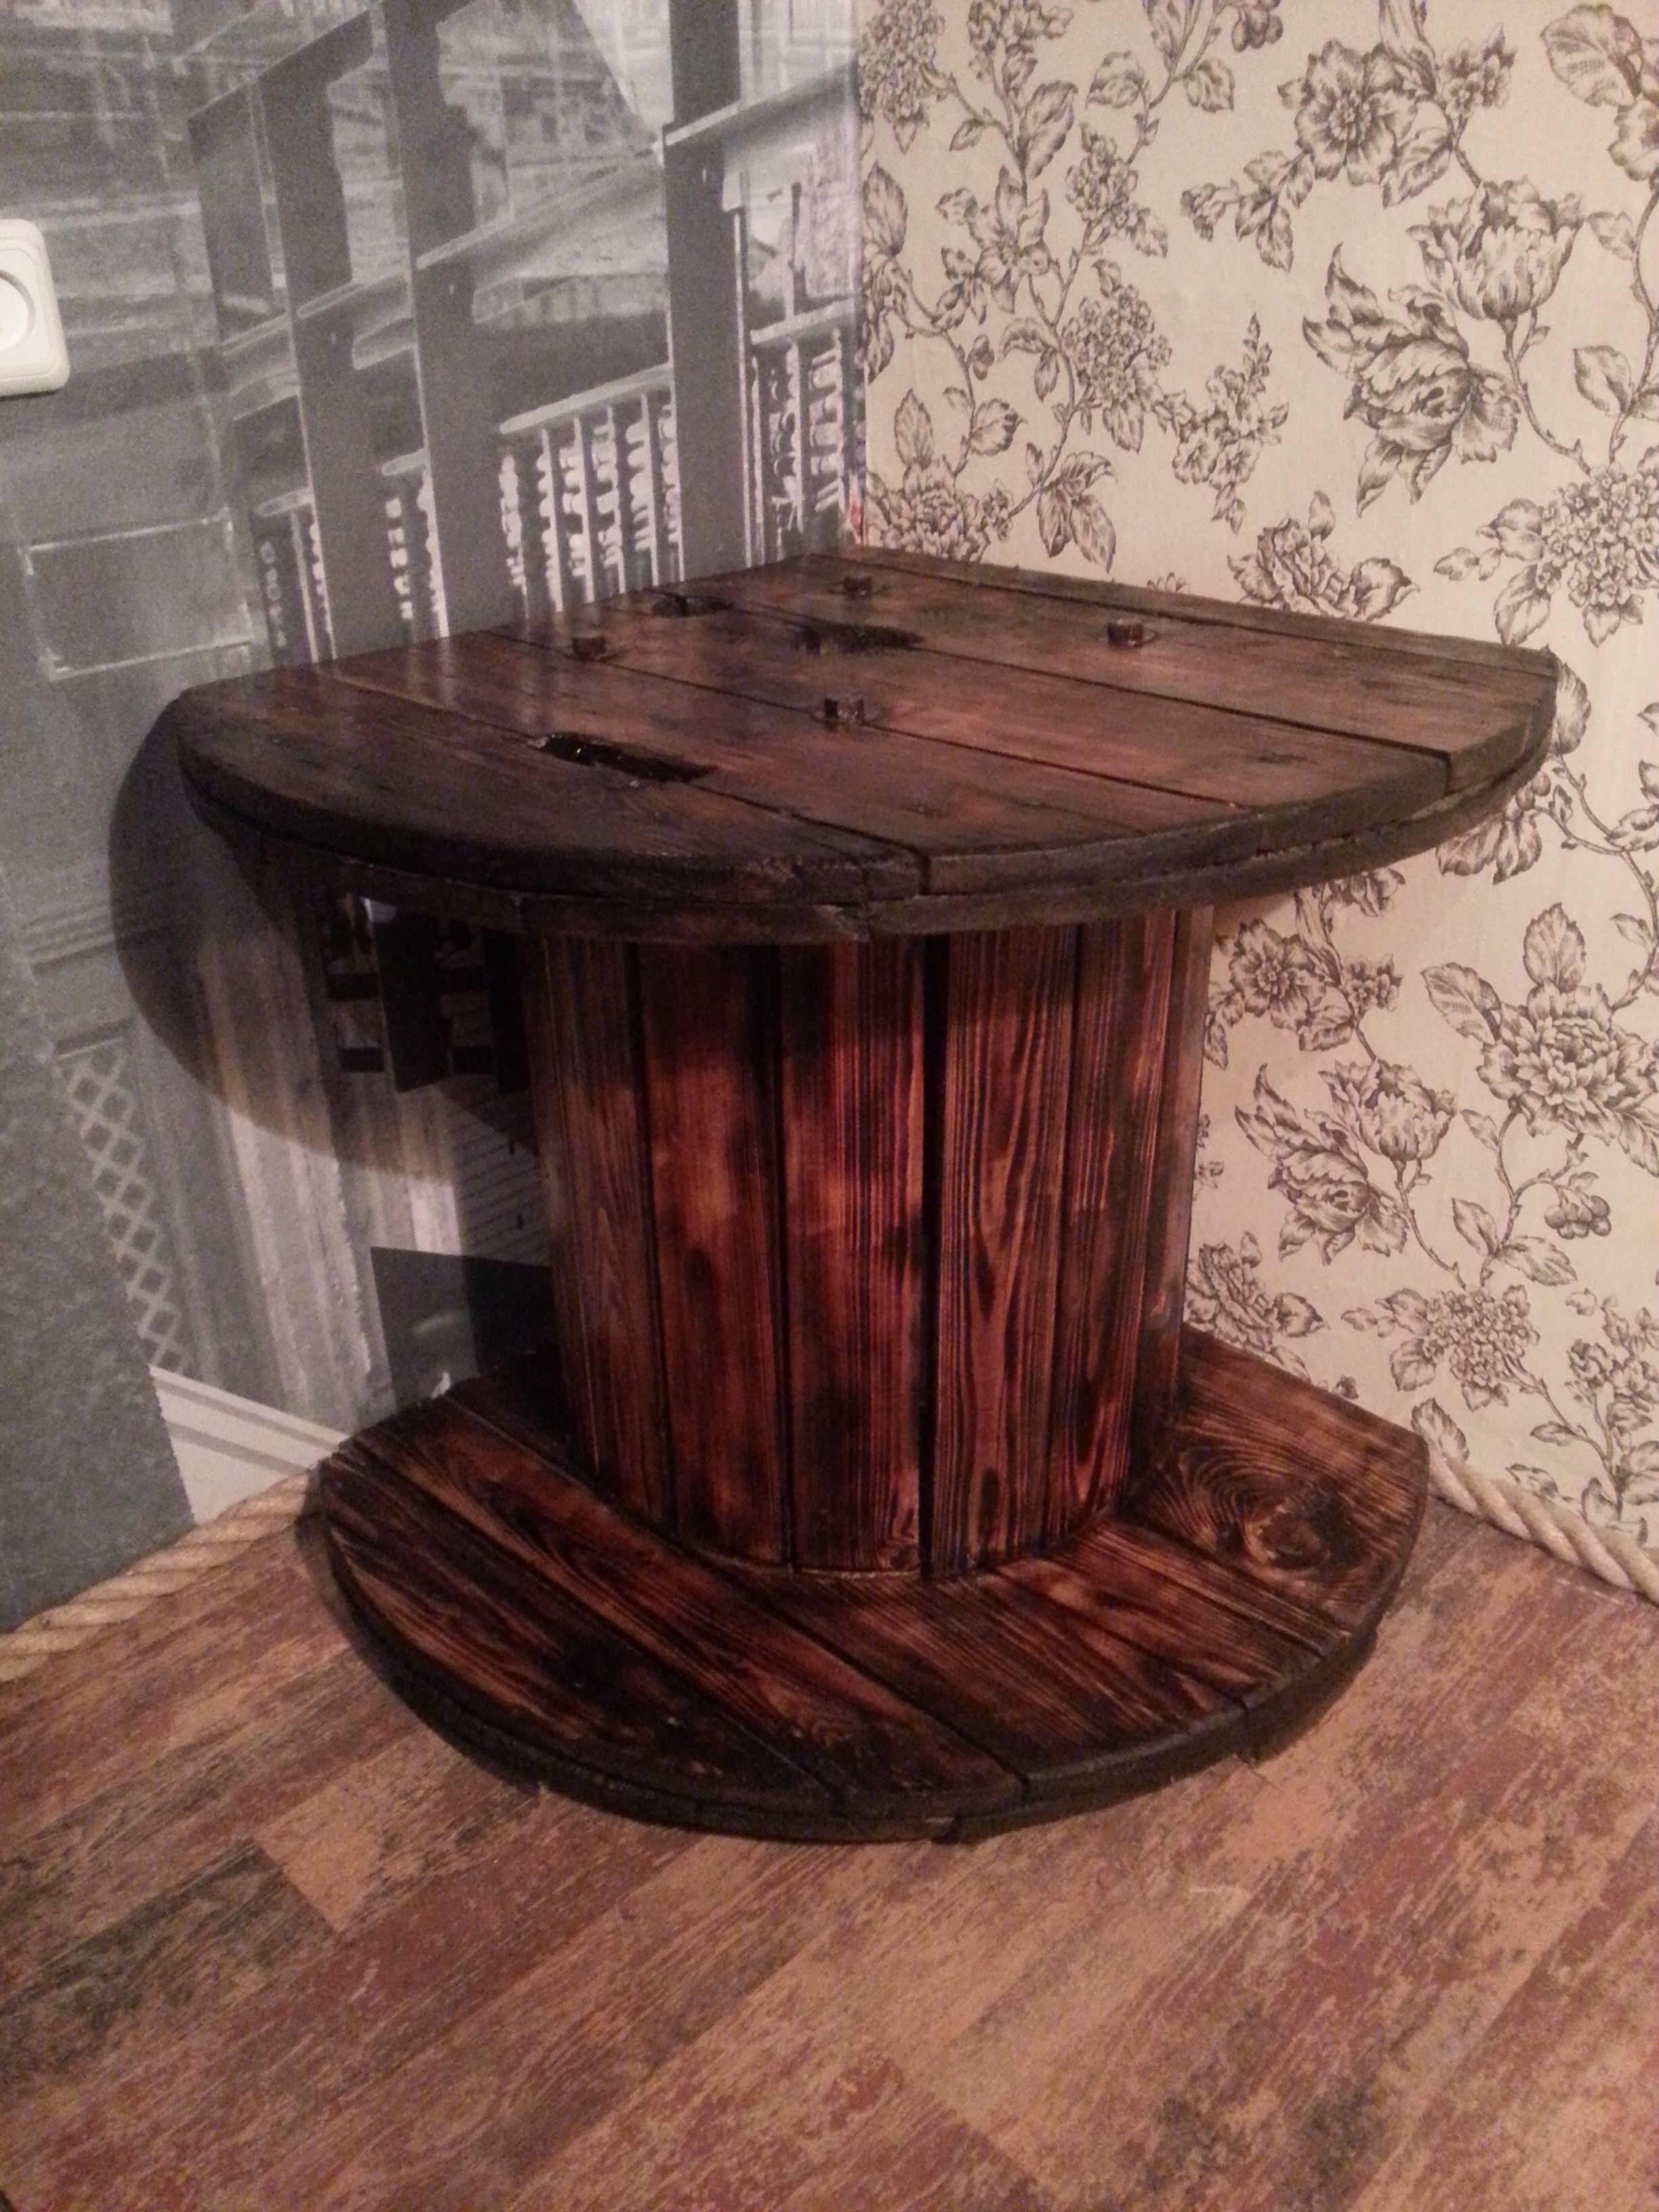 Corner Tv Table Made From A Reused Reel Bobine Bidon Et Pneu # Menuiserie Table Tele